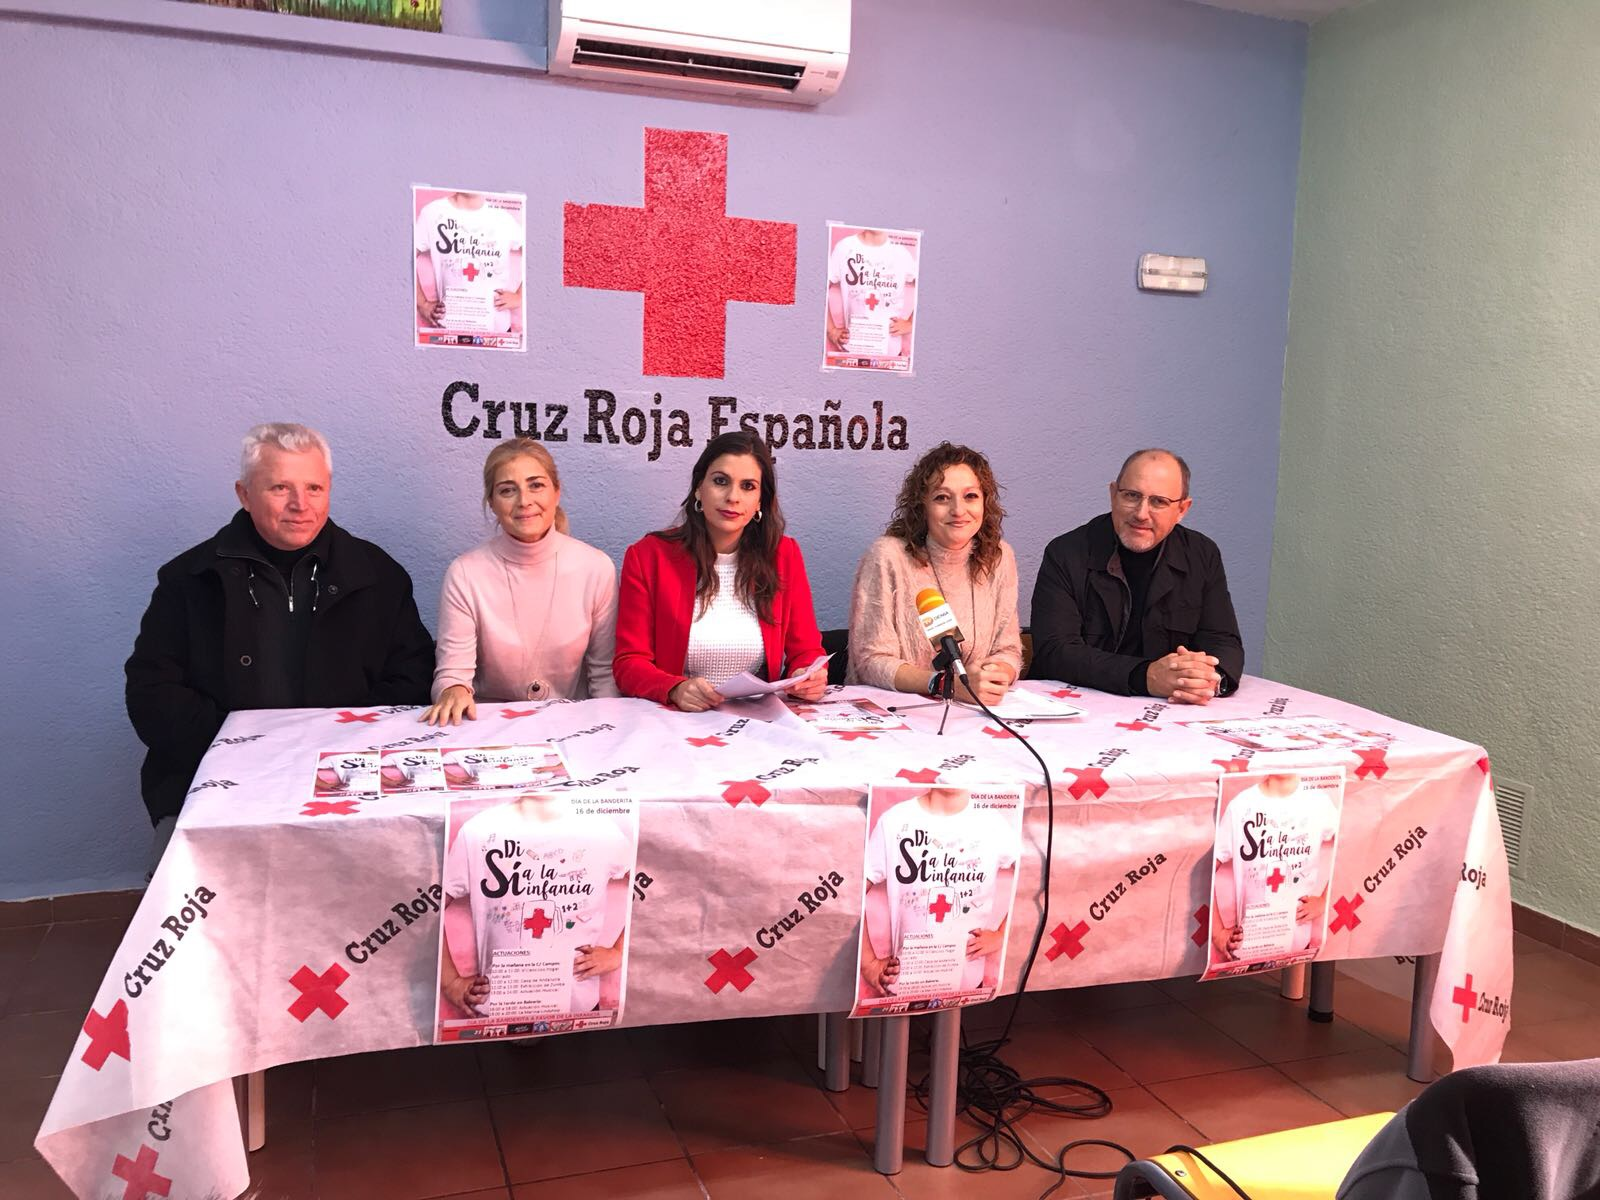 Fundació Baleària colabora con Cruz Roja en La Fiesta de la Banderita